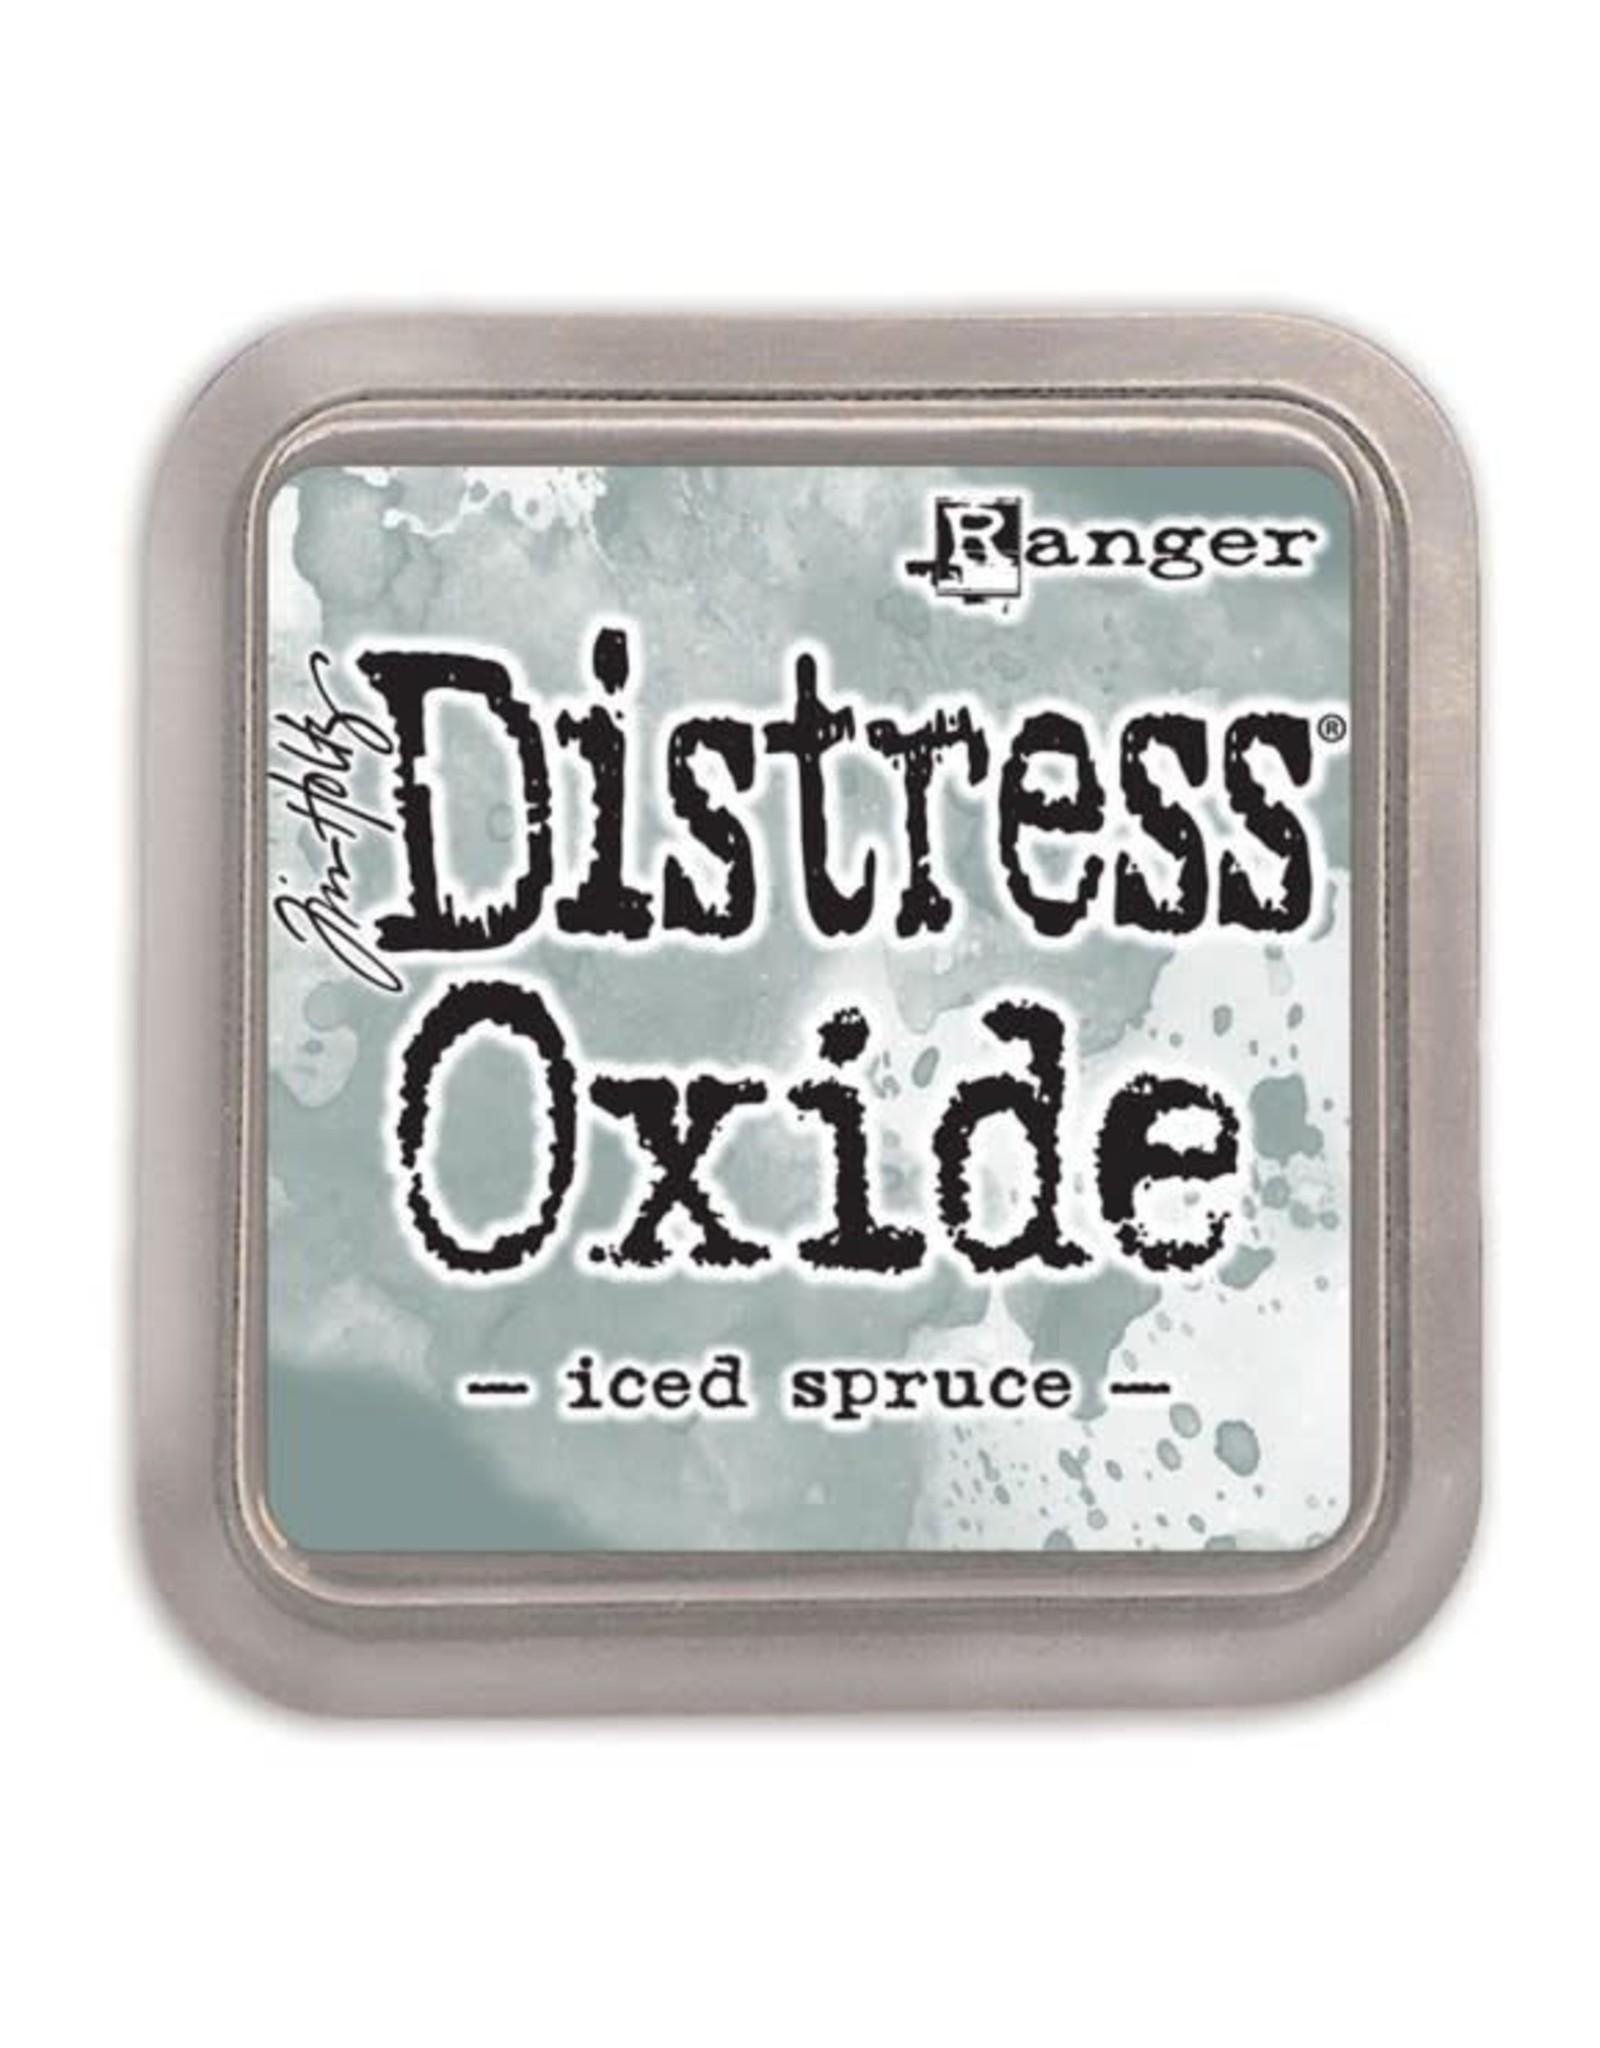 Ranger Distress Oxide Ranger Distress Oxide - iced spruce